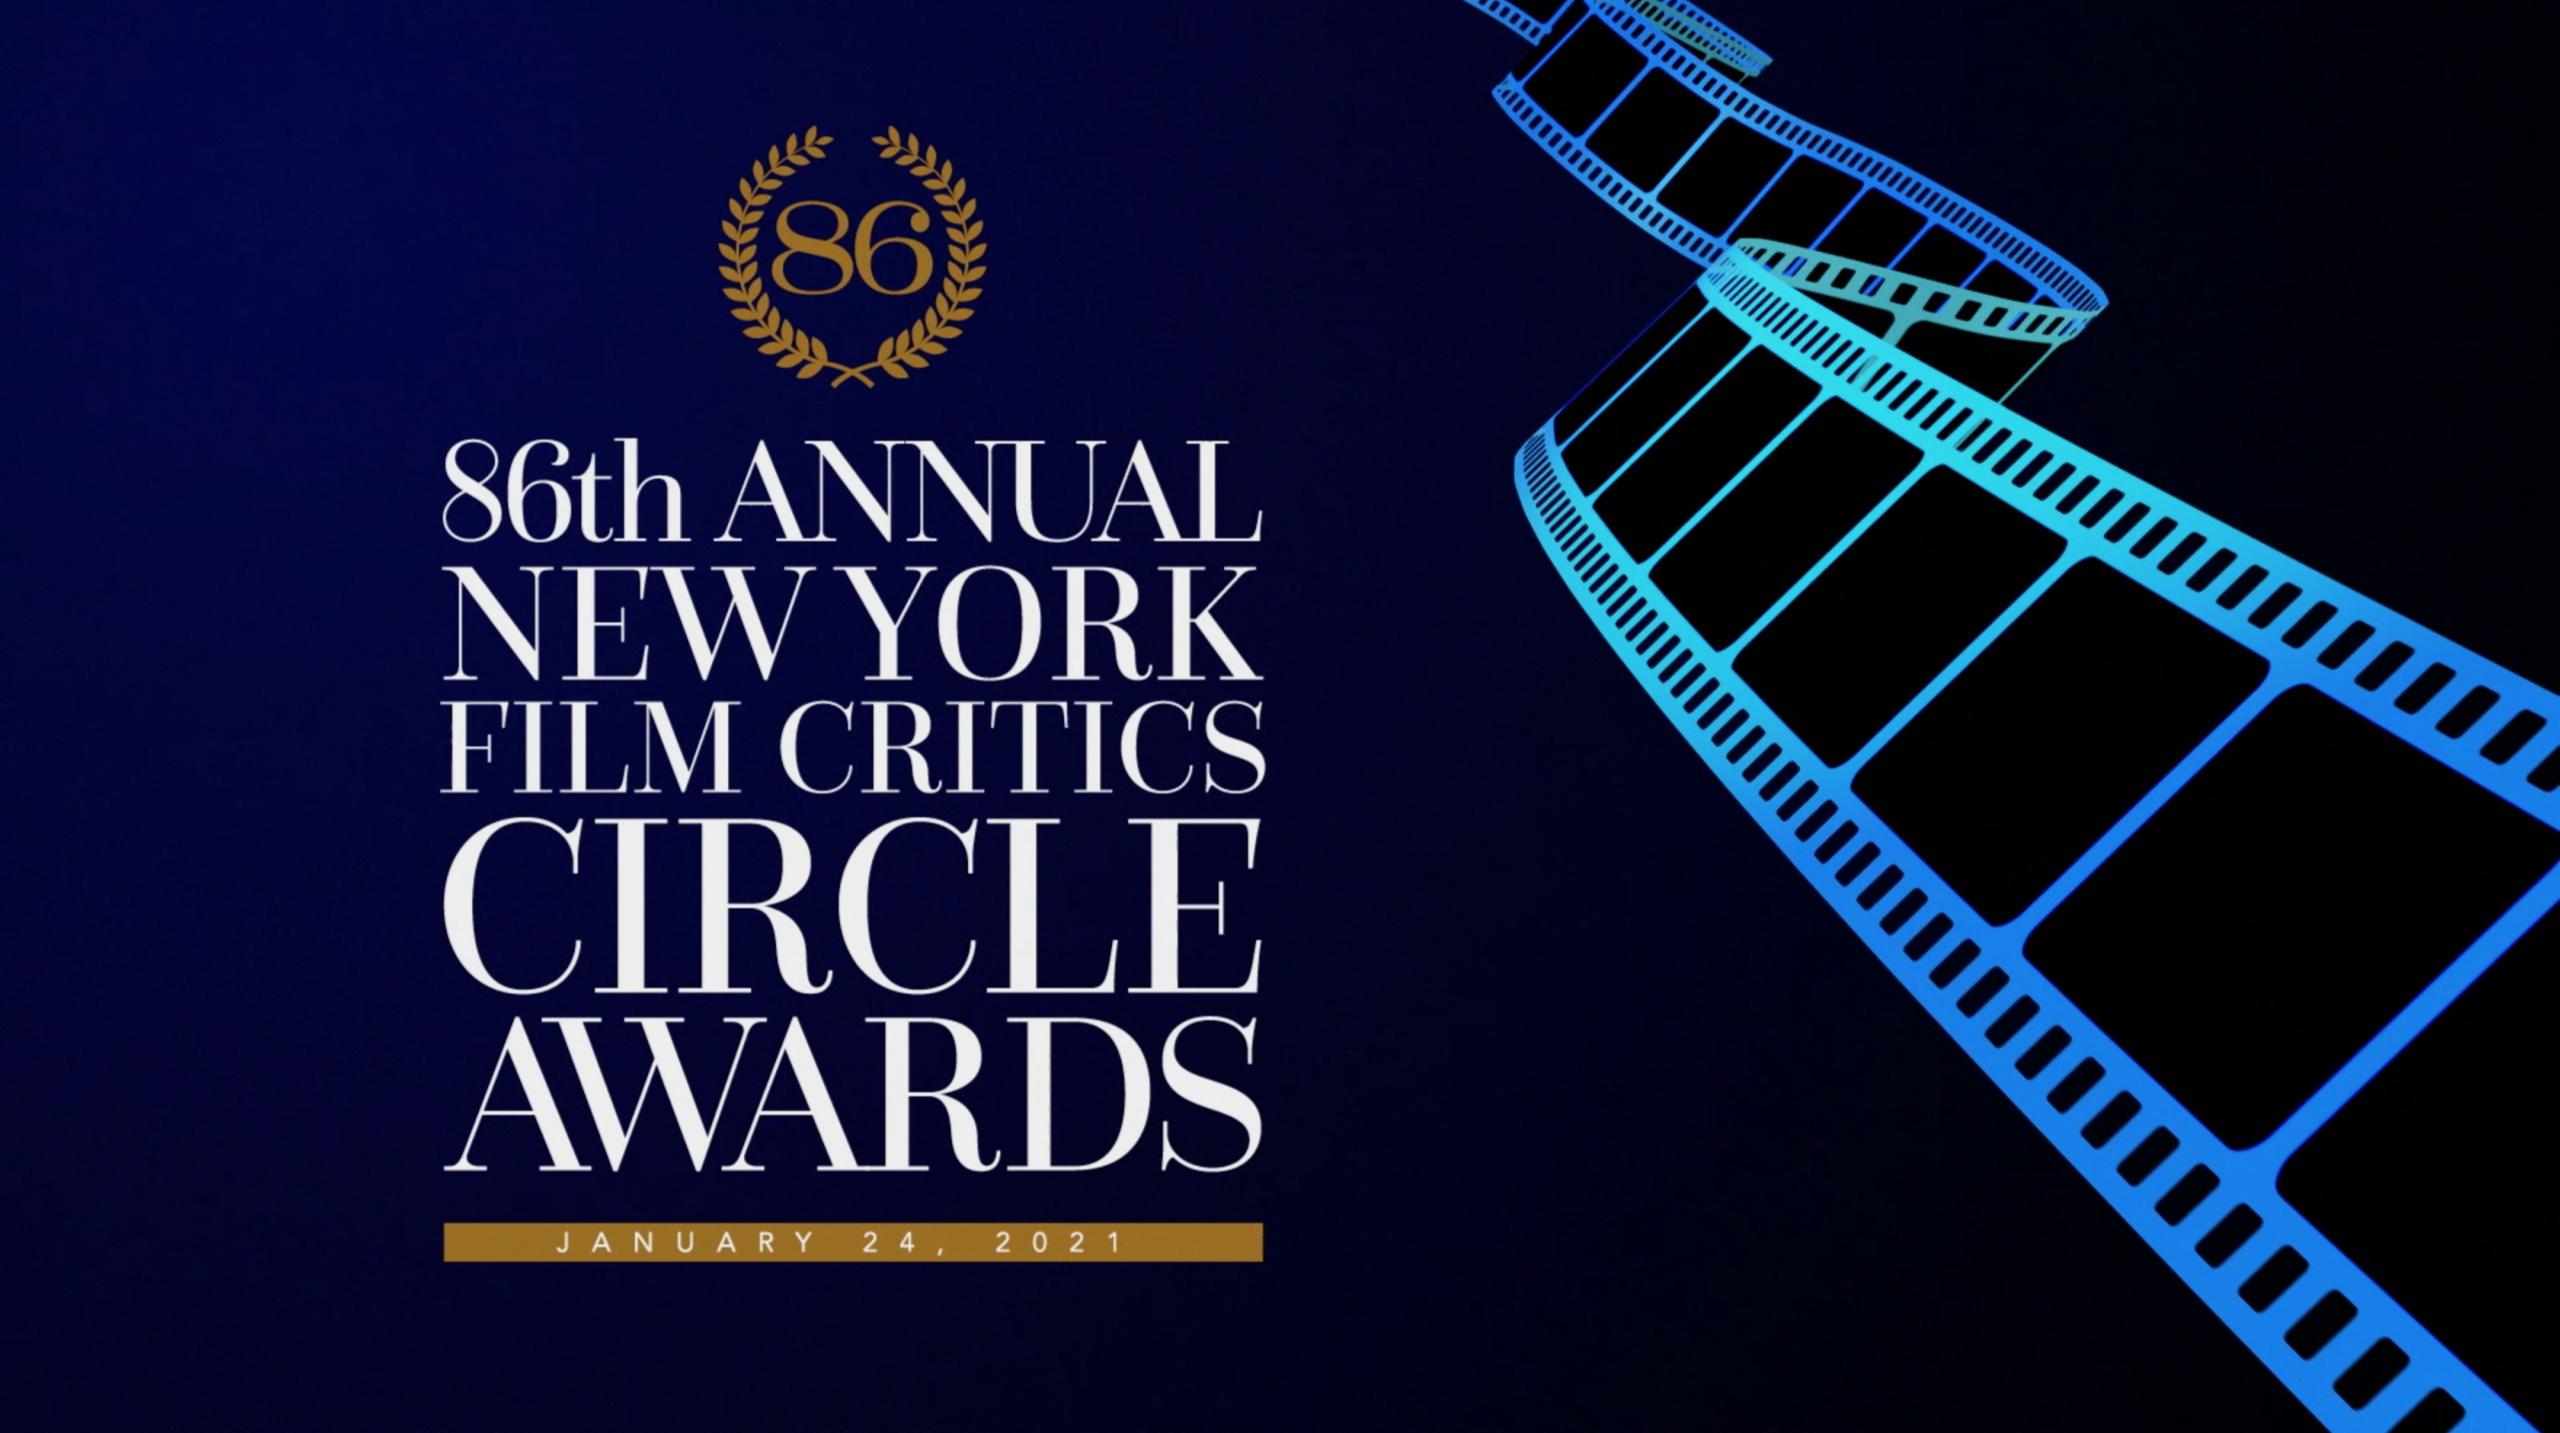 New York Film Critics Circle